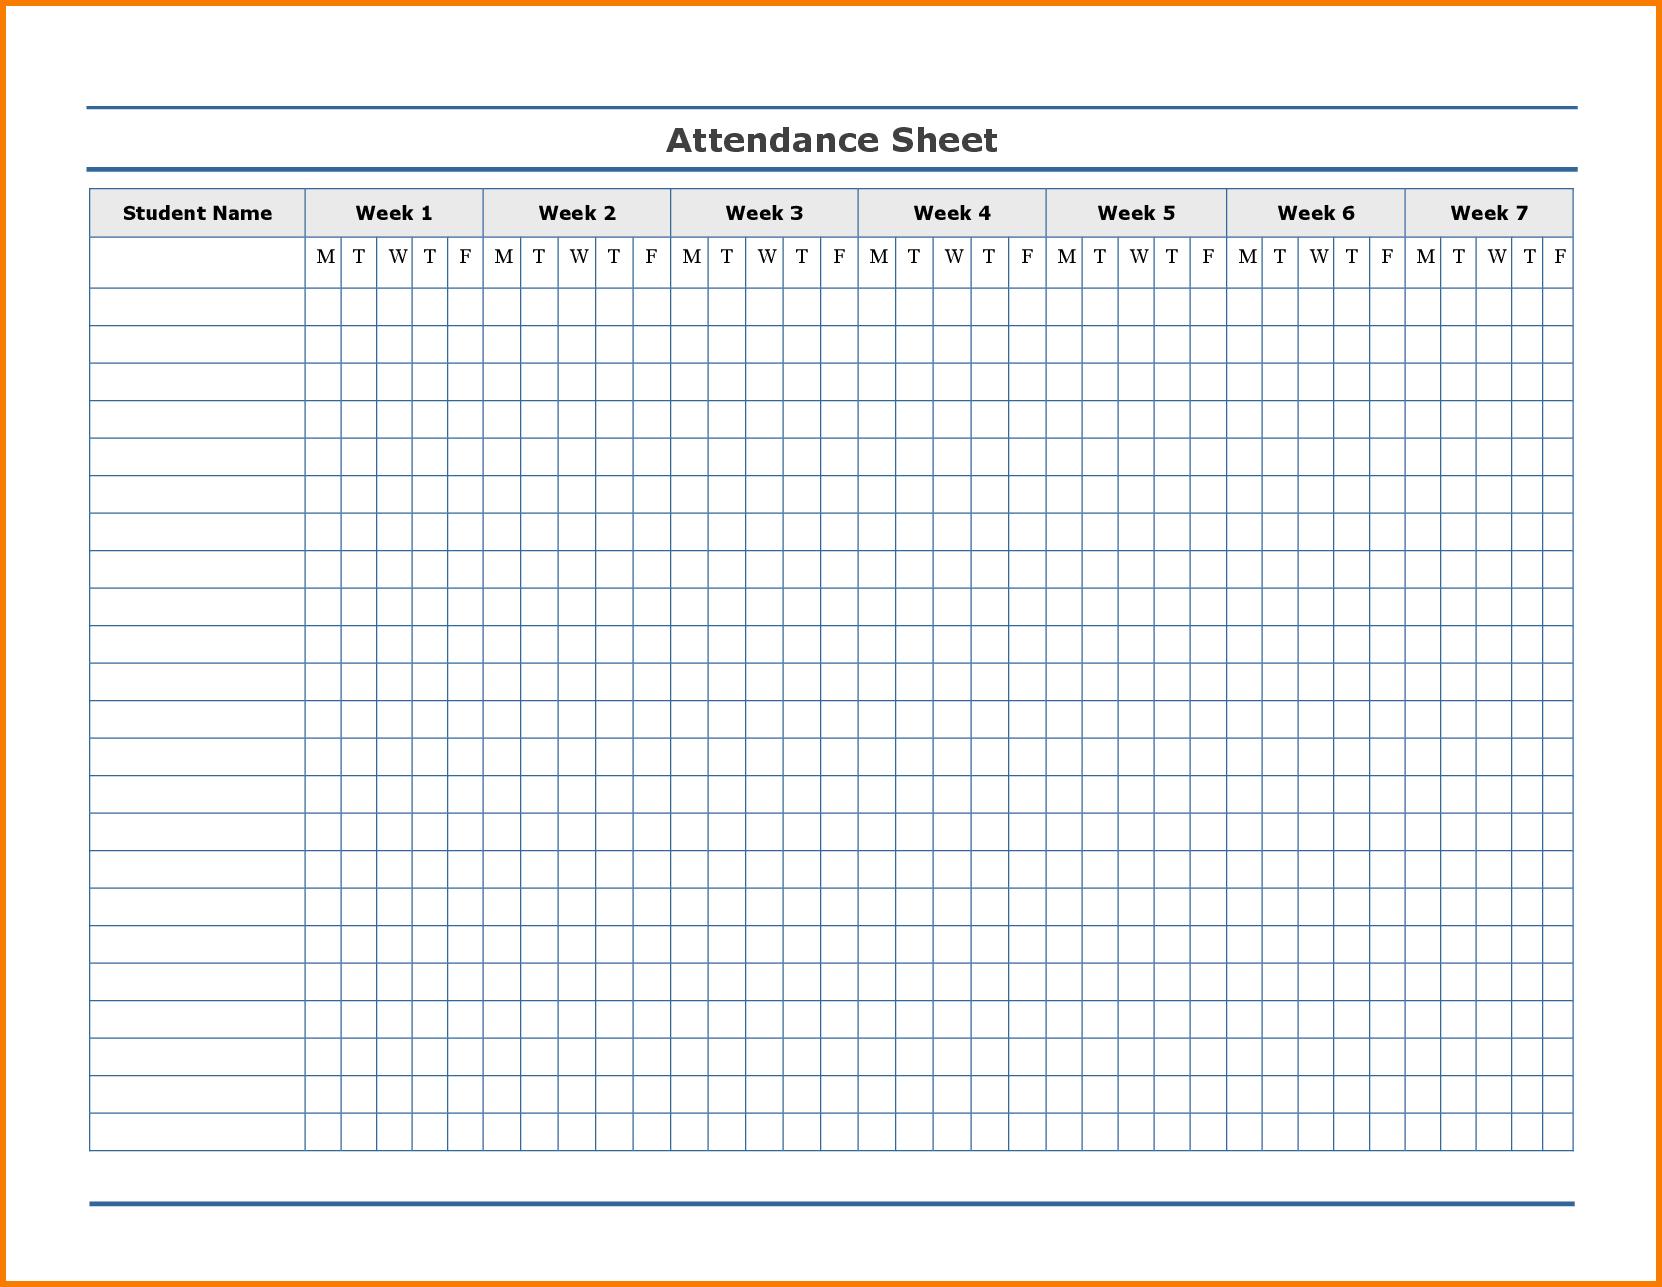 Printable Attendance Tracker | Attendance Tracker